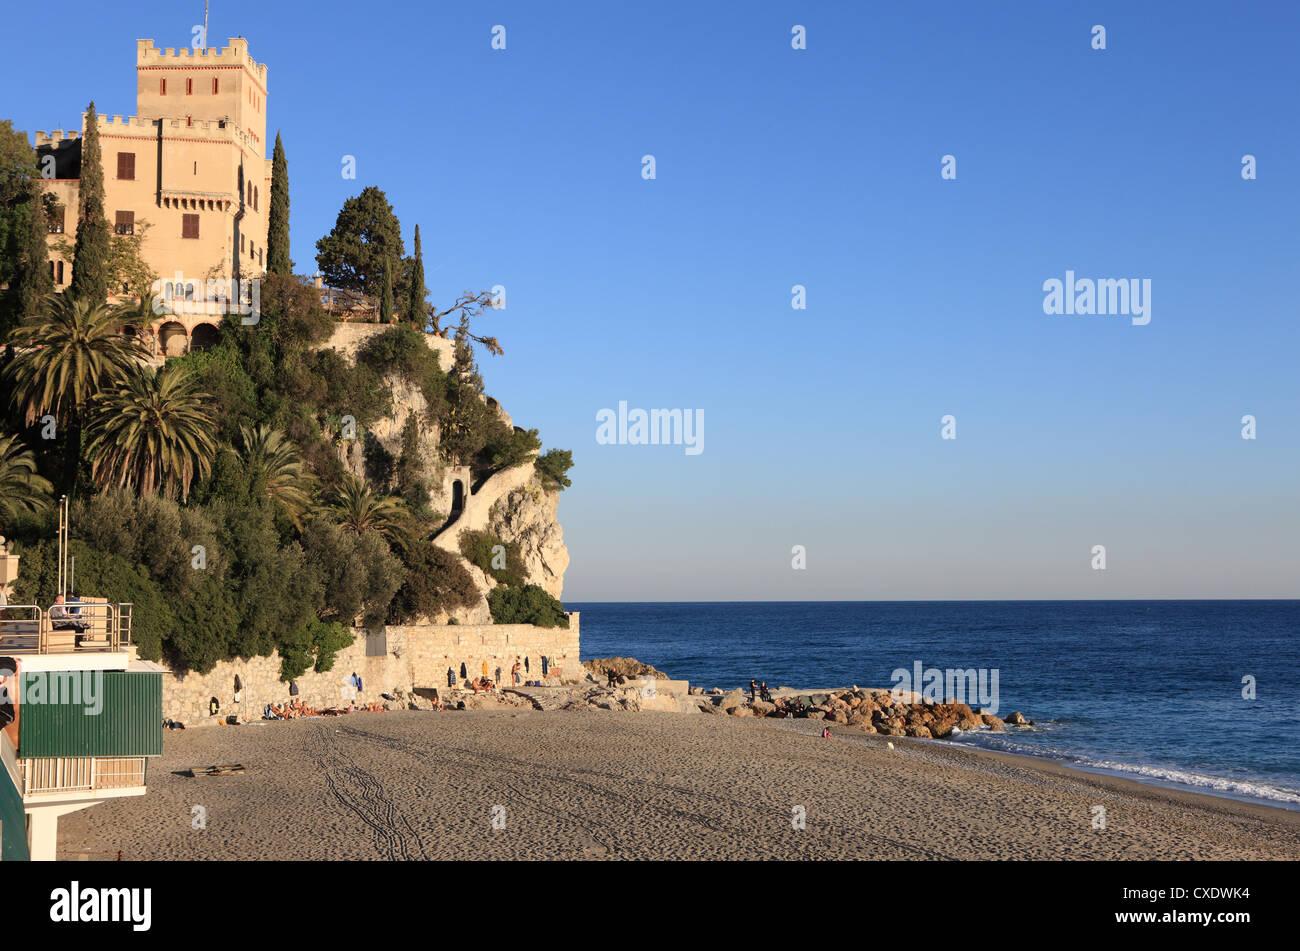 Beach, Finale Ligure, Liguria, Italy Stock Photo